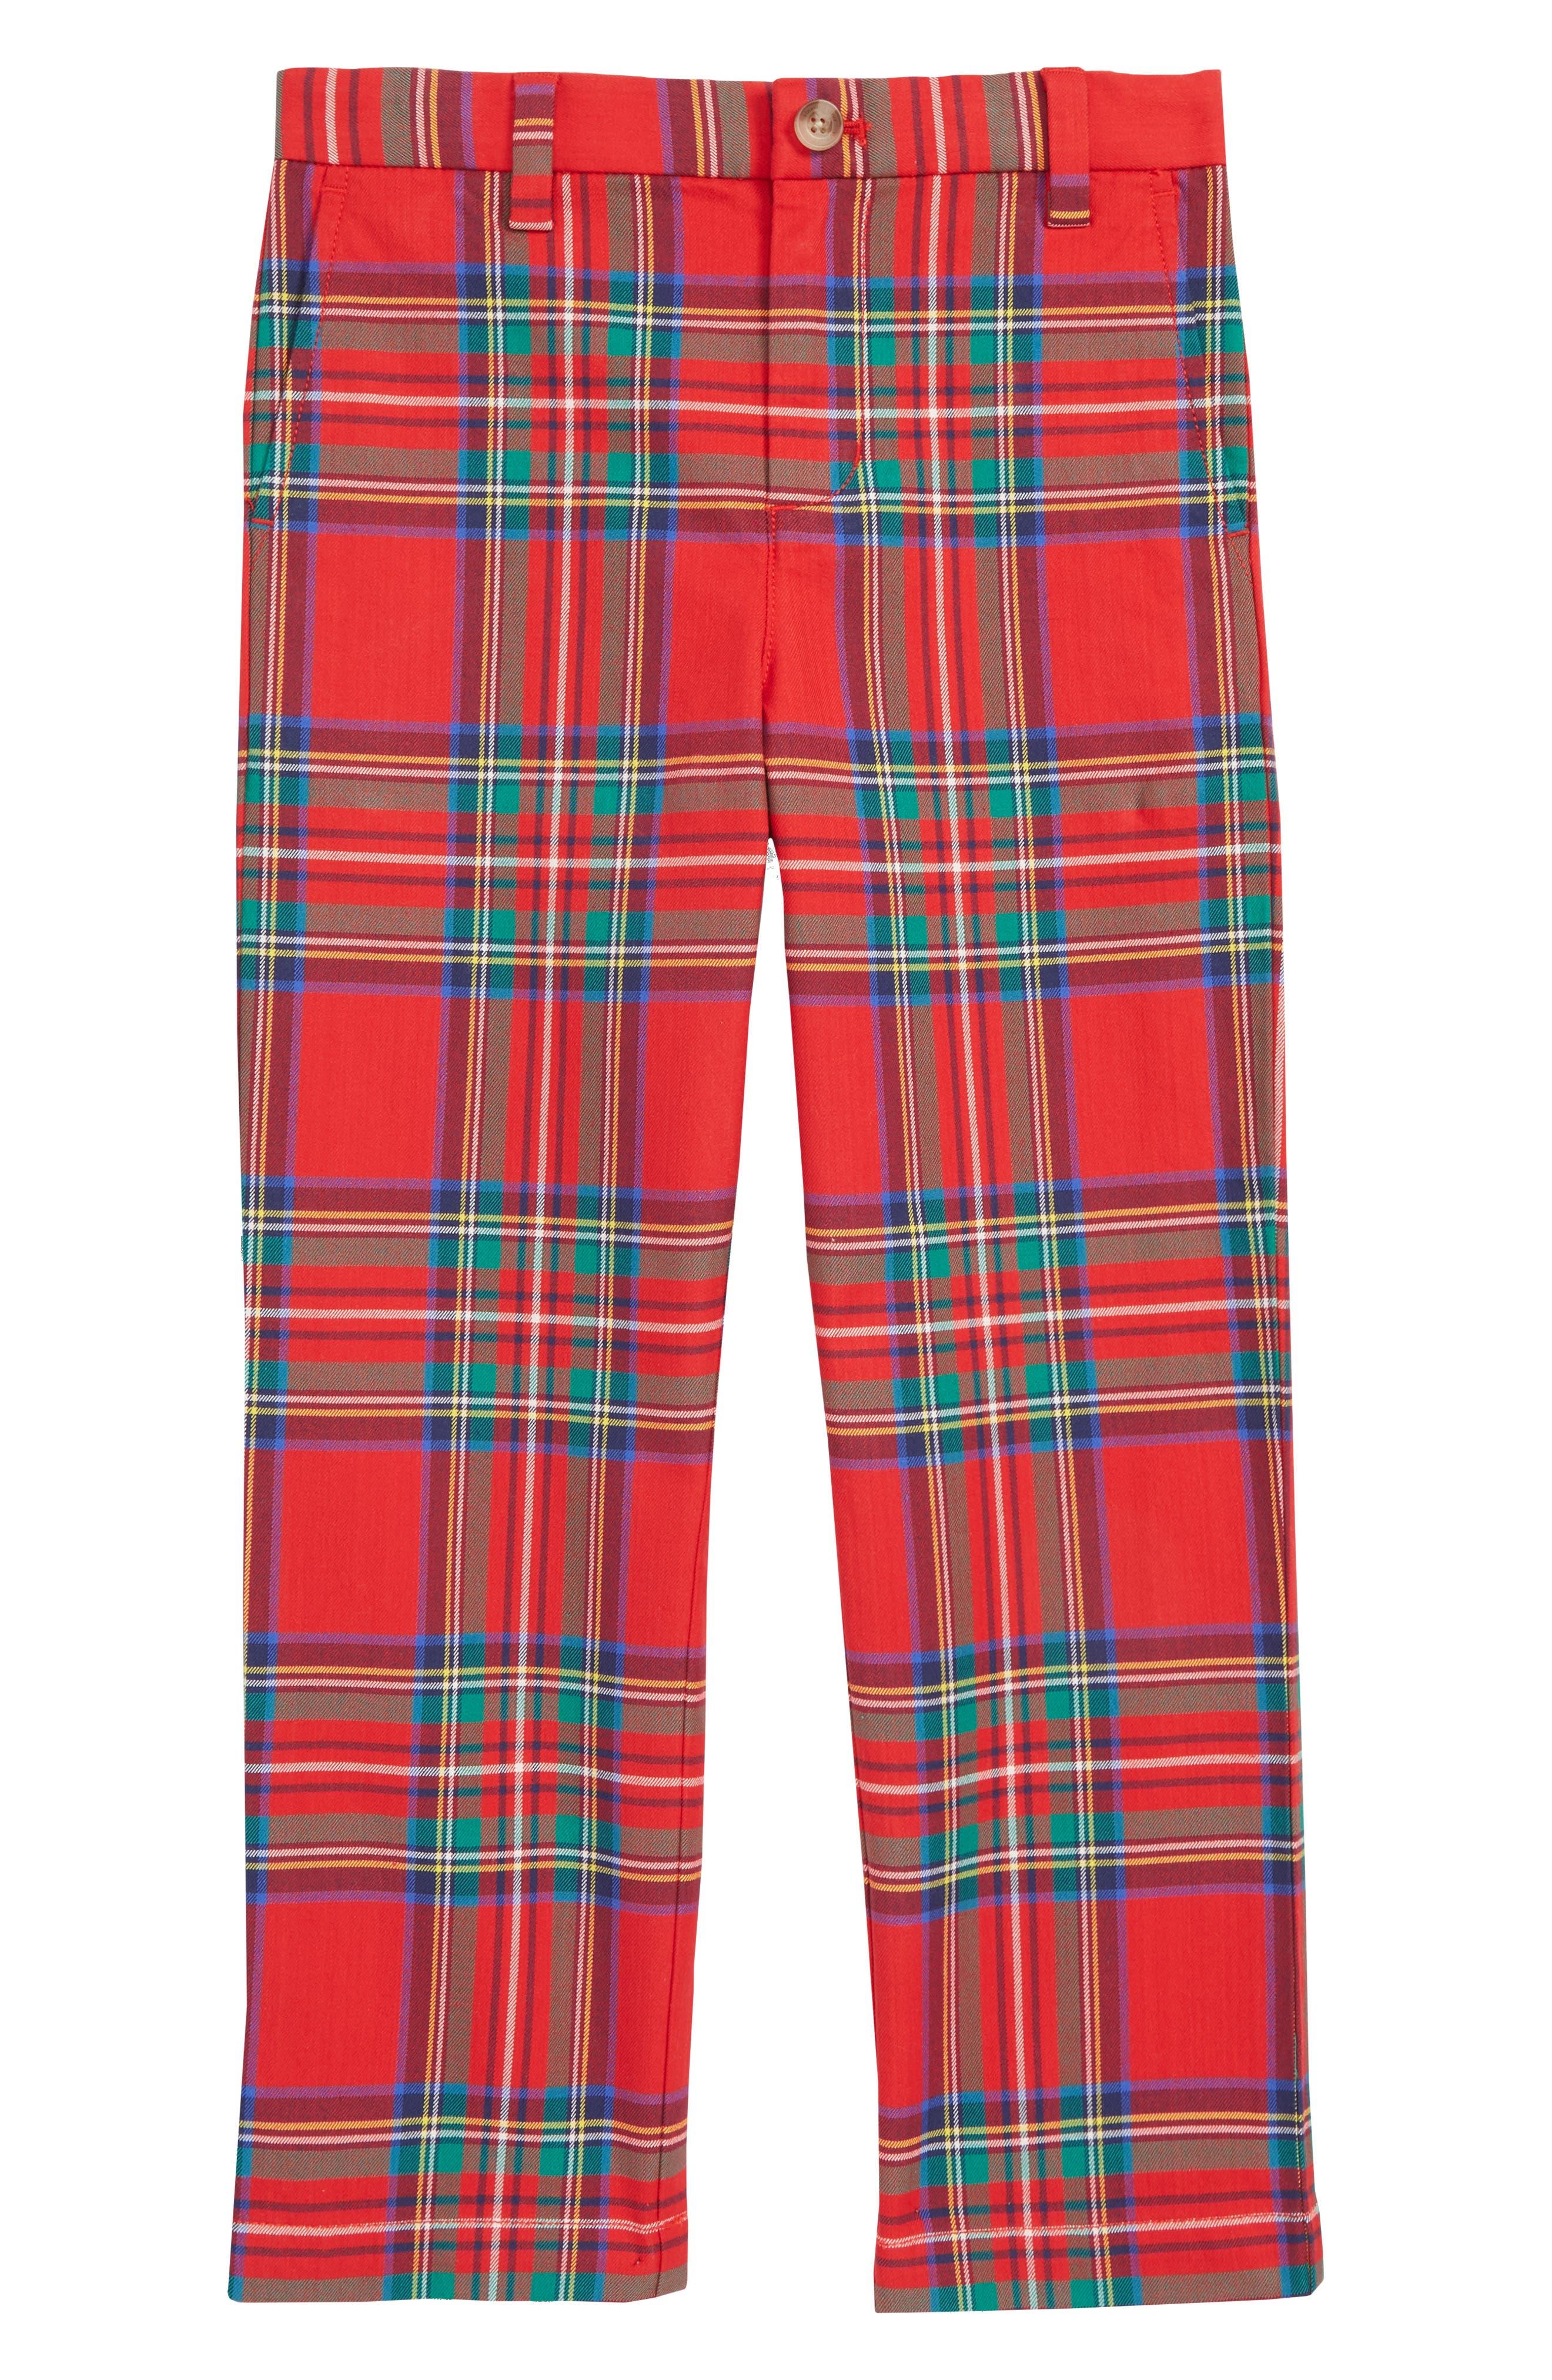 VINEYARD VINES, Jolly Plaid Breaker Pants, Main thumbnail 1, color, LIGHTHOUSE RED